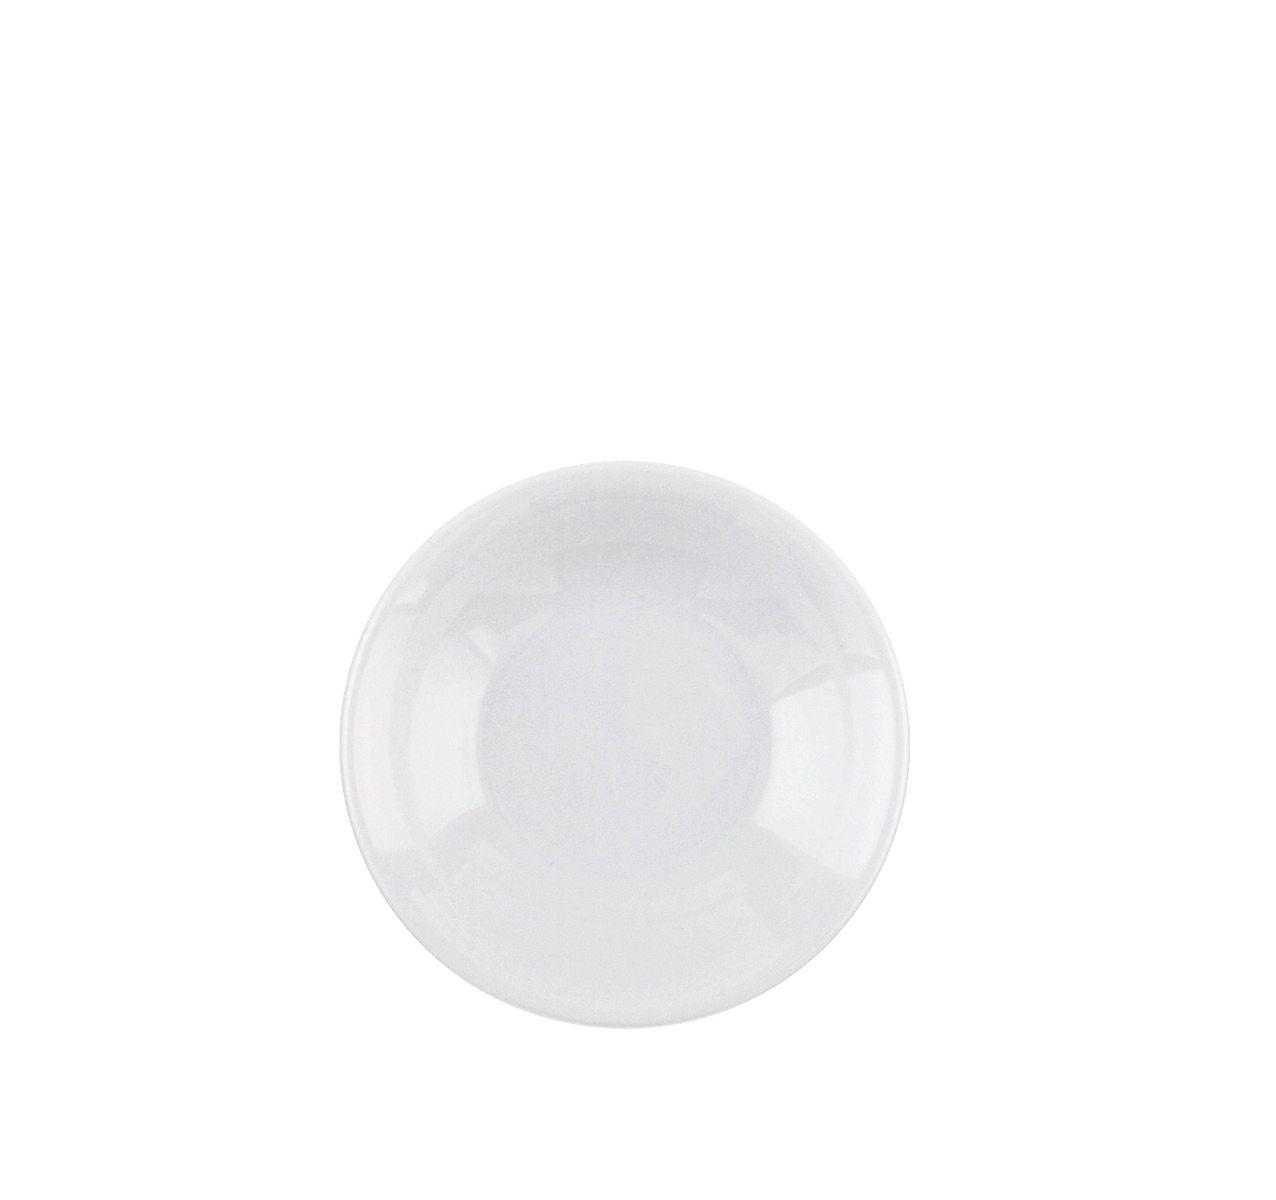 The White Snow - Round Serving Bowl 34